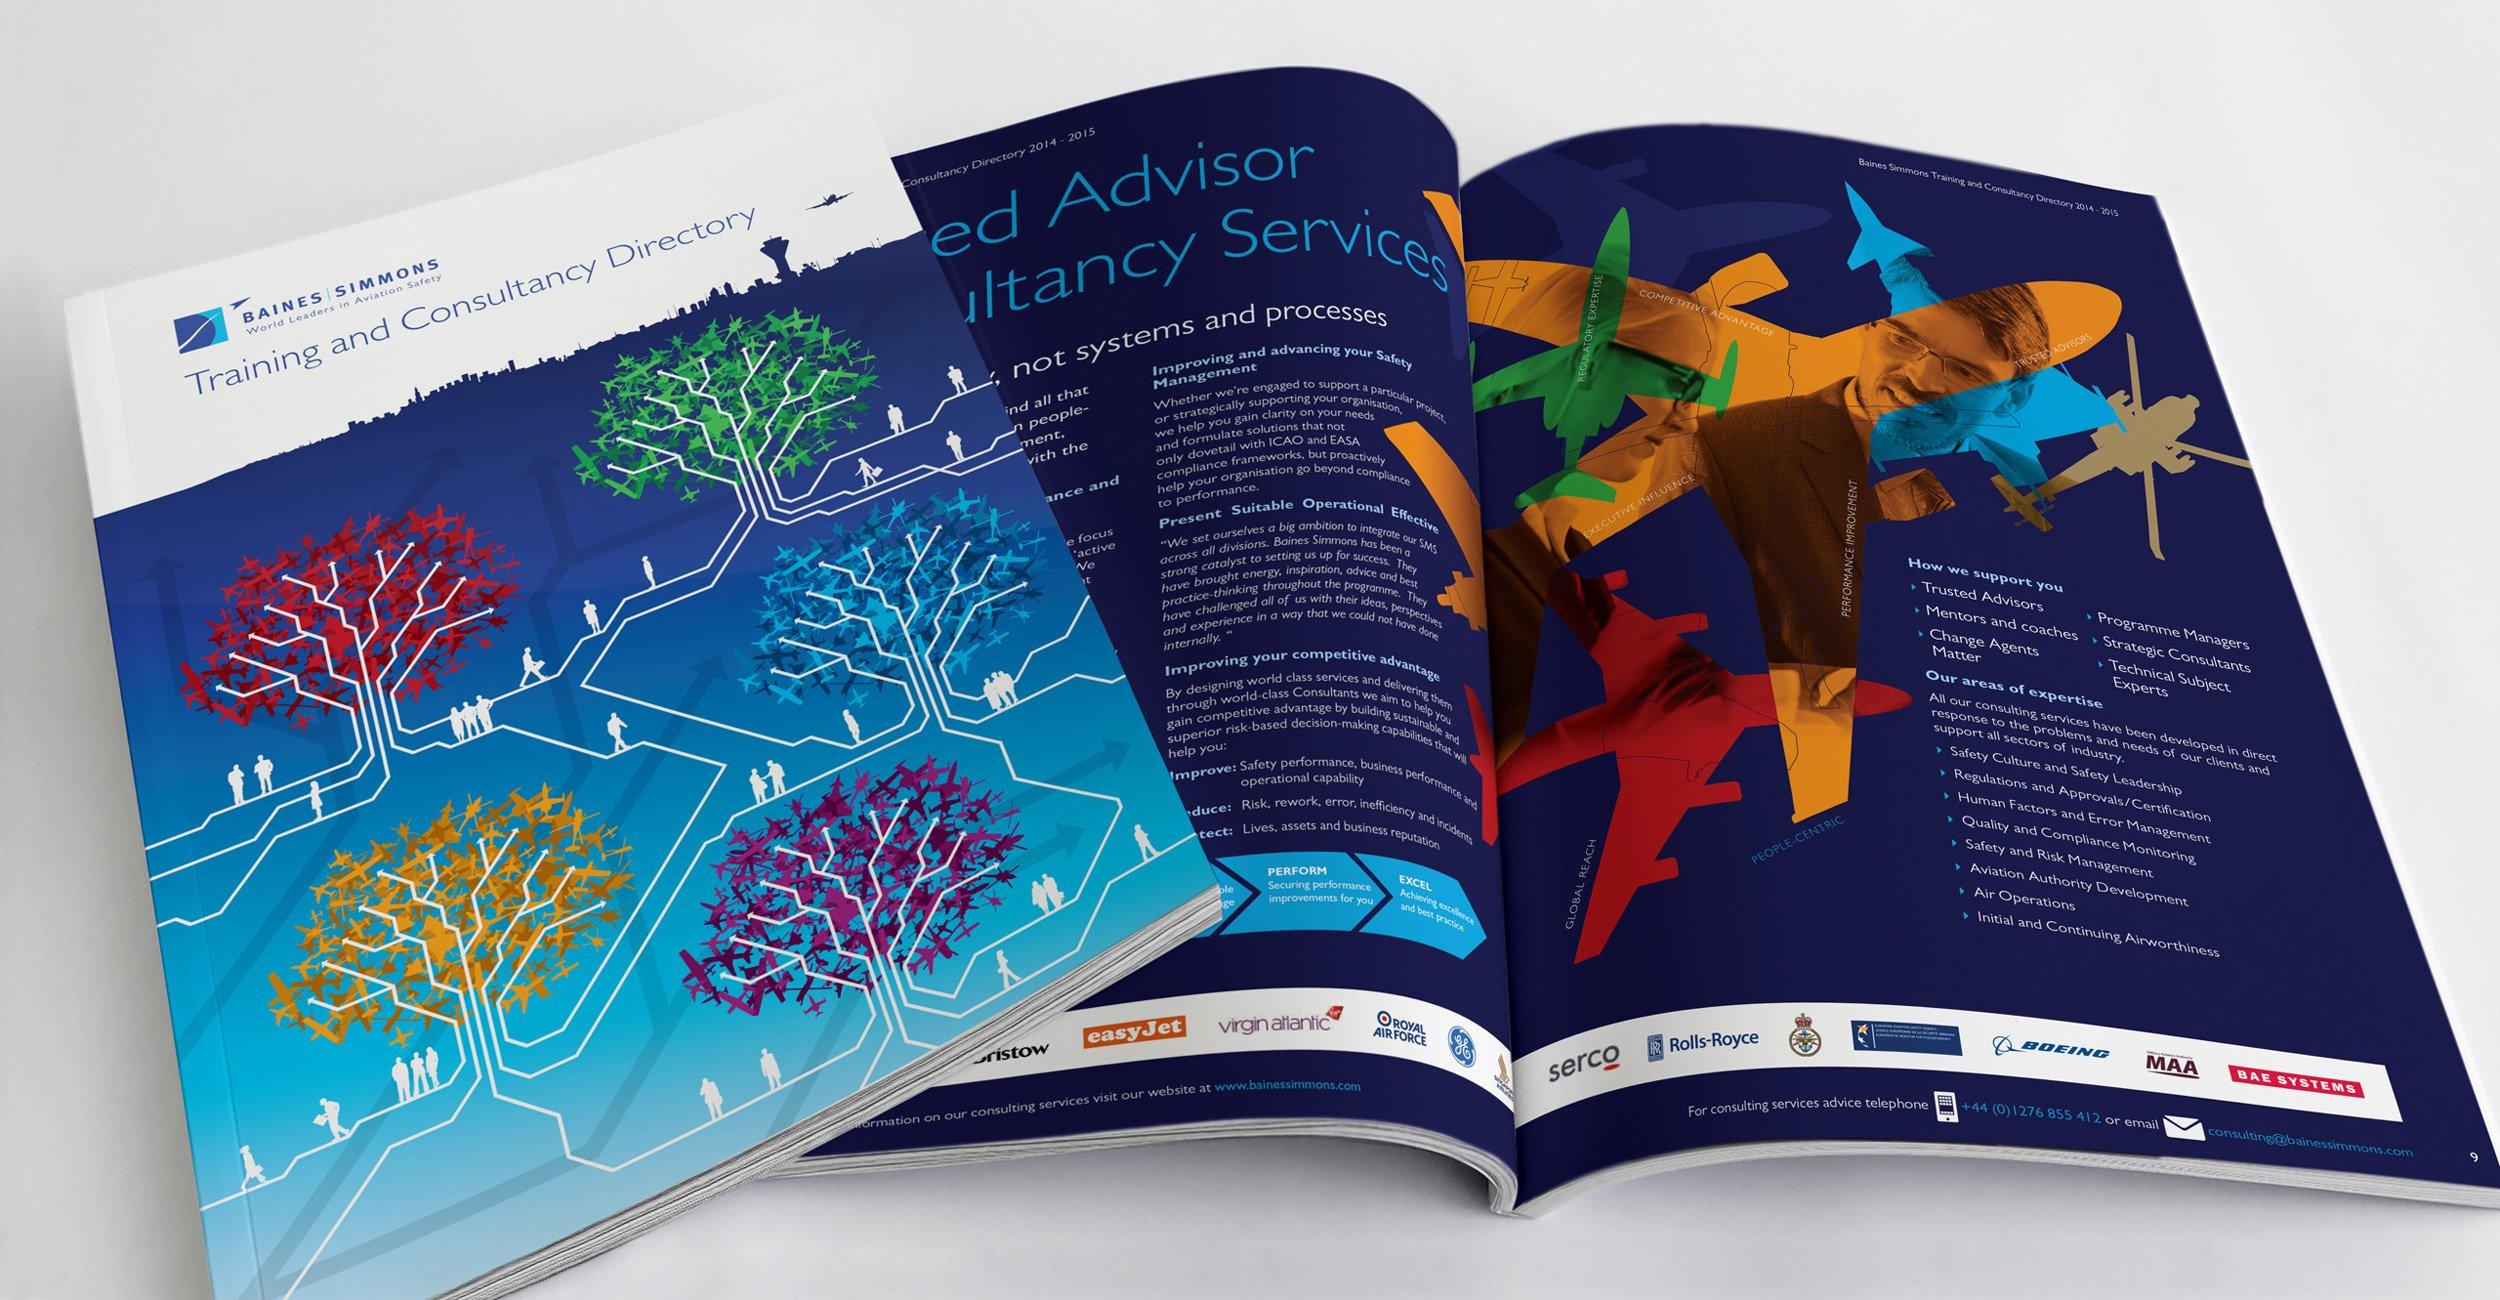 Baines Simmons Training Directory Design